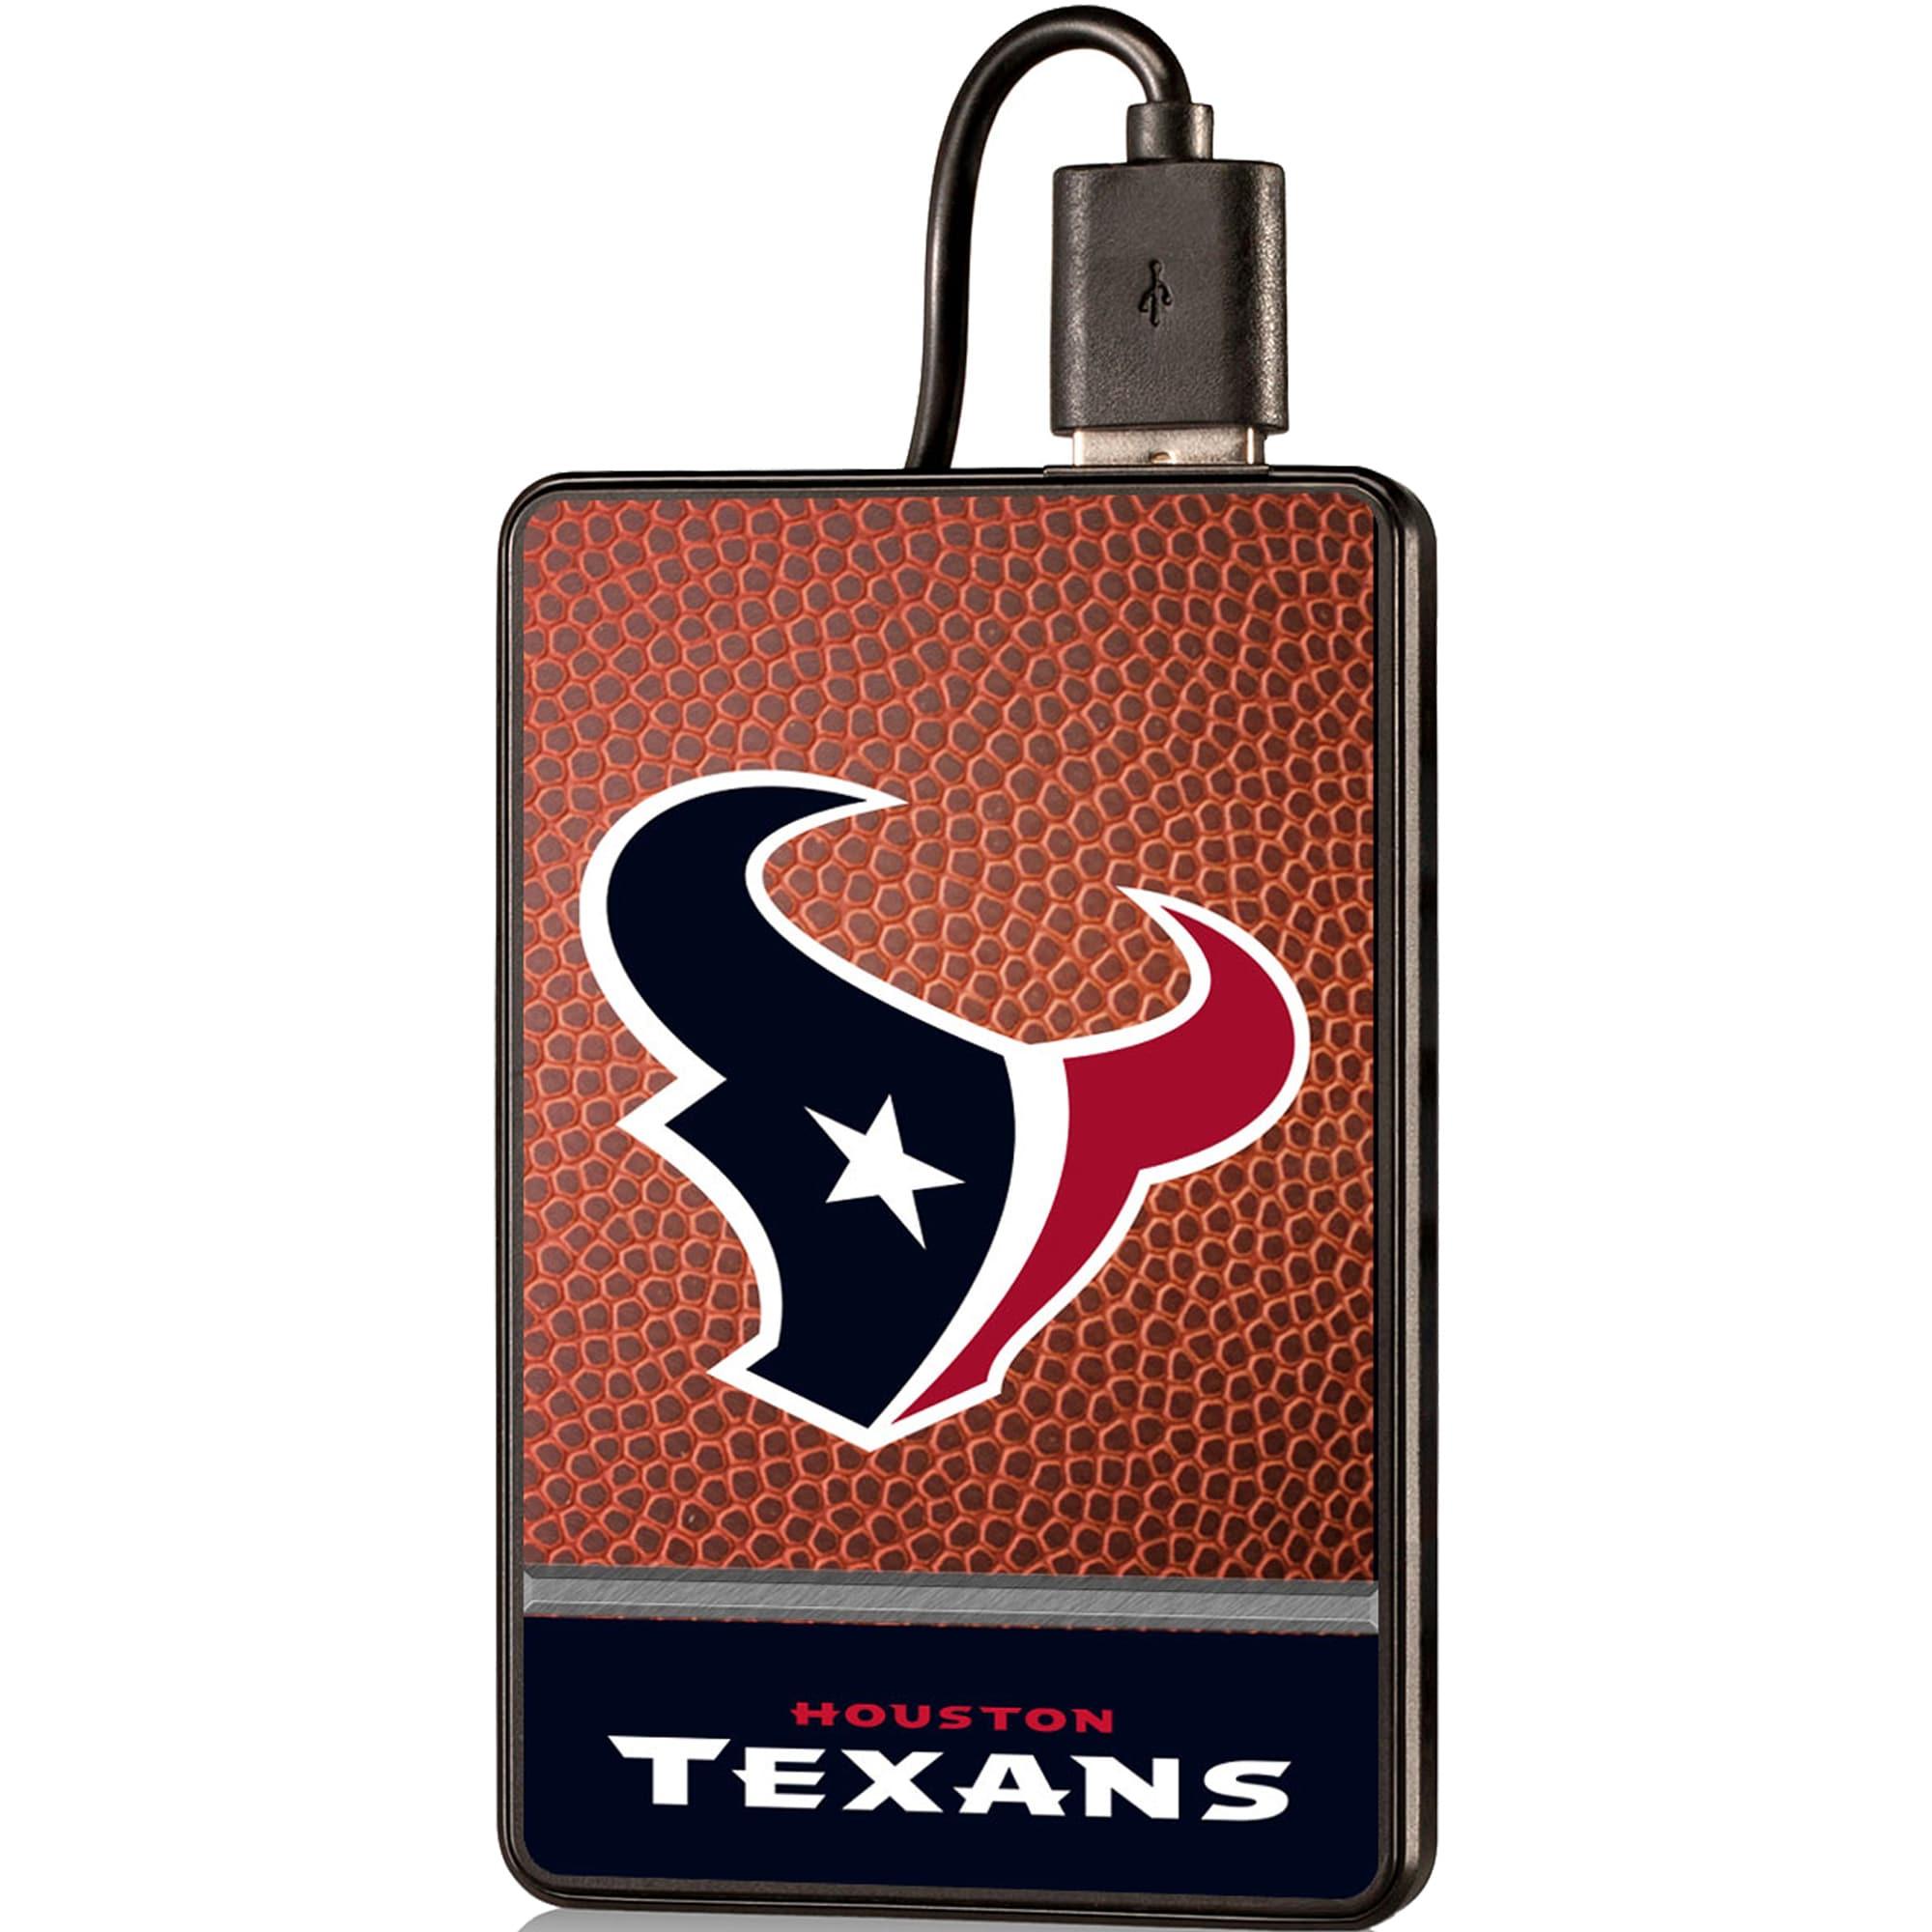 Houston Texans 2000 mAh Credit Card Powerbank